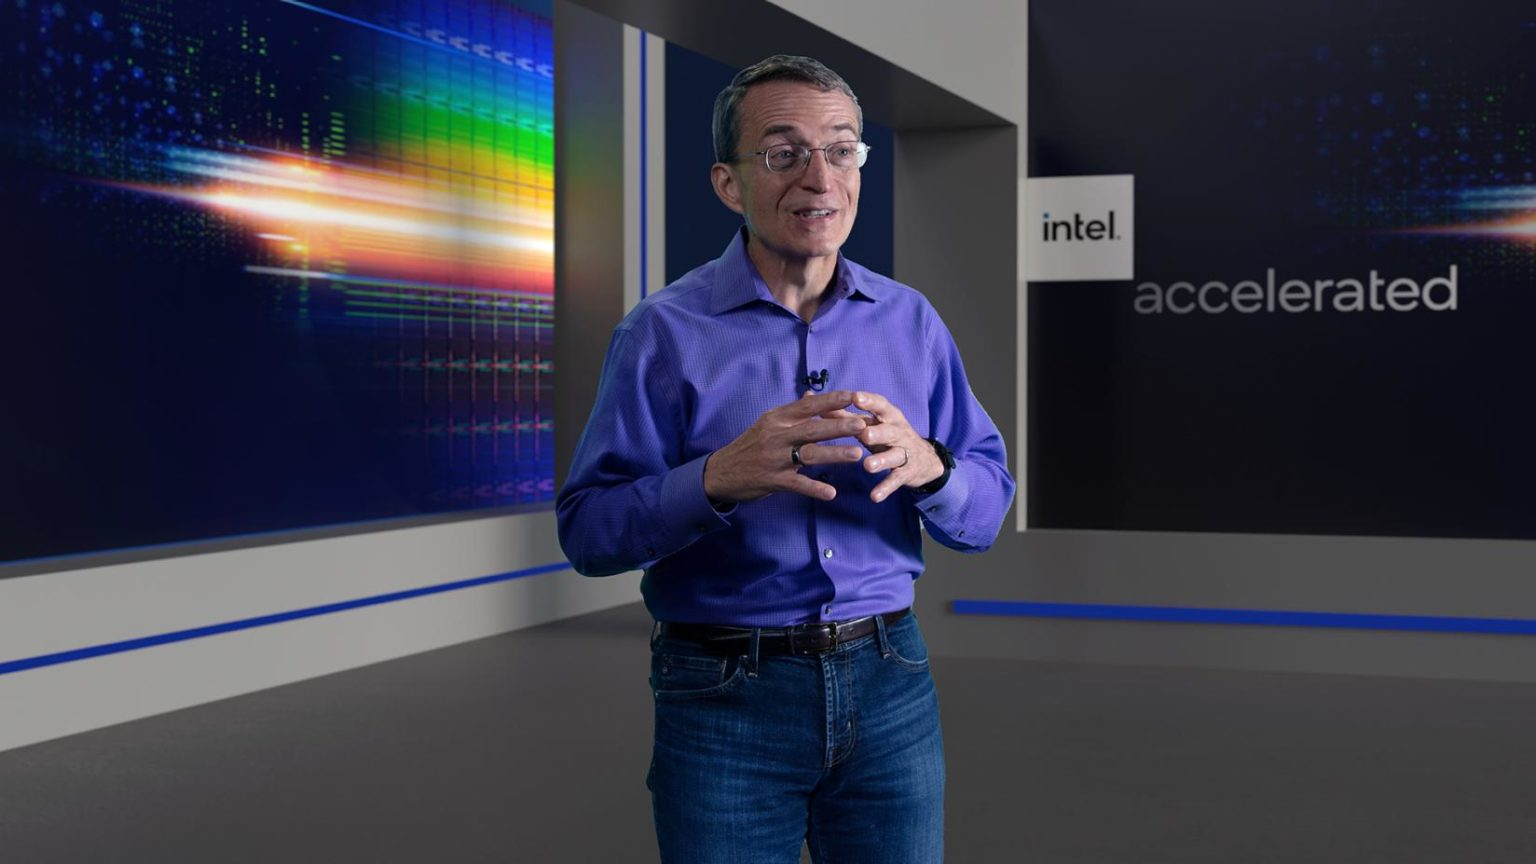 Intel-Accelerated-Pat-Gelsinger-1.jpg.rendition.intel.web.1648.927